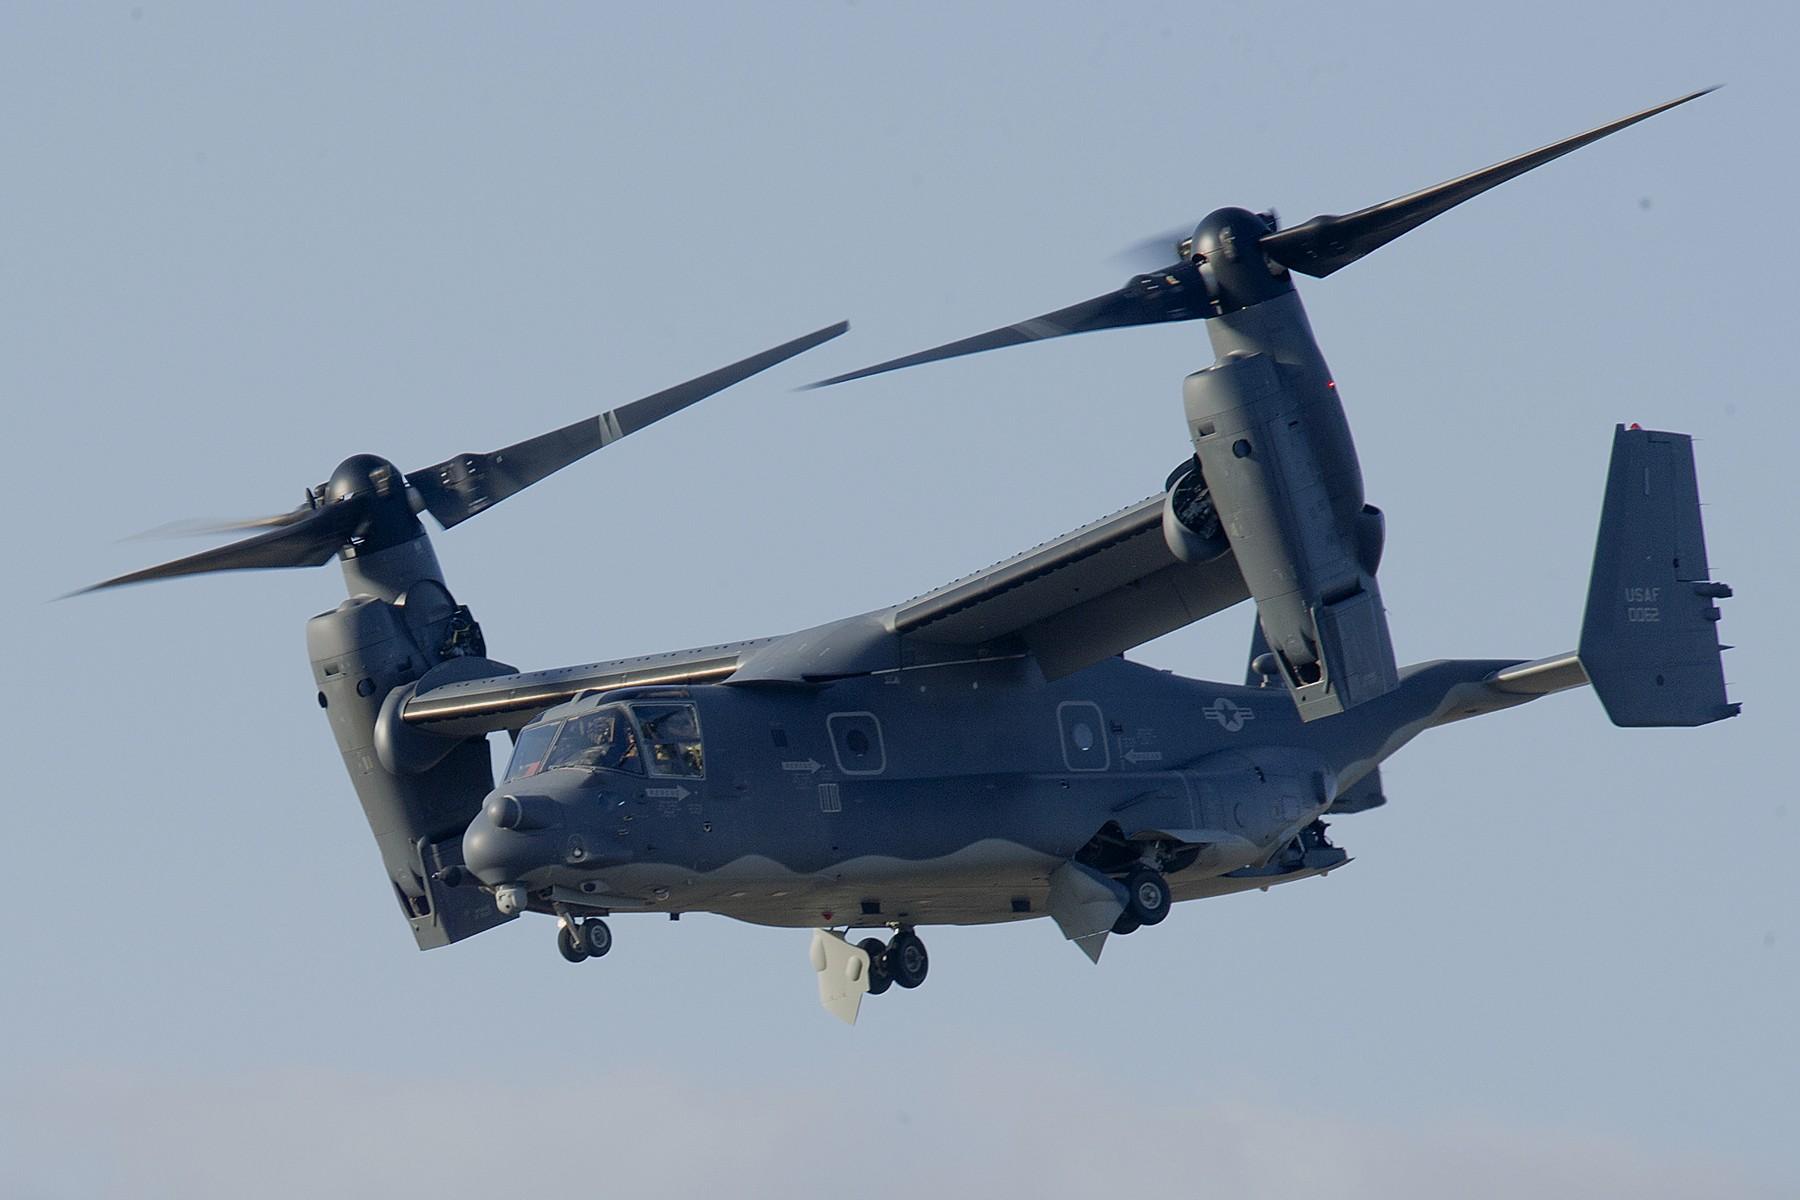 V 22 Osprey Quotes Engine Diagram Wallpaper Tiltrotor Multi Mission Aircraft